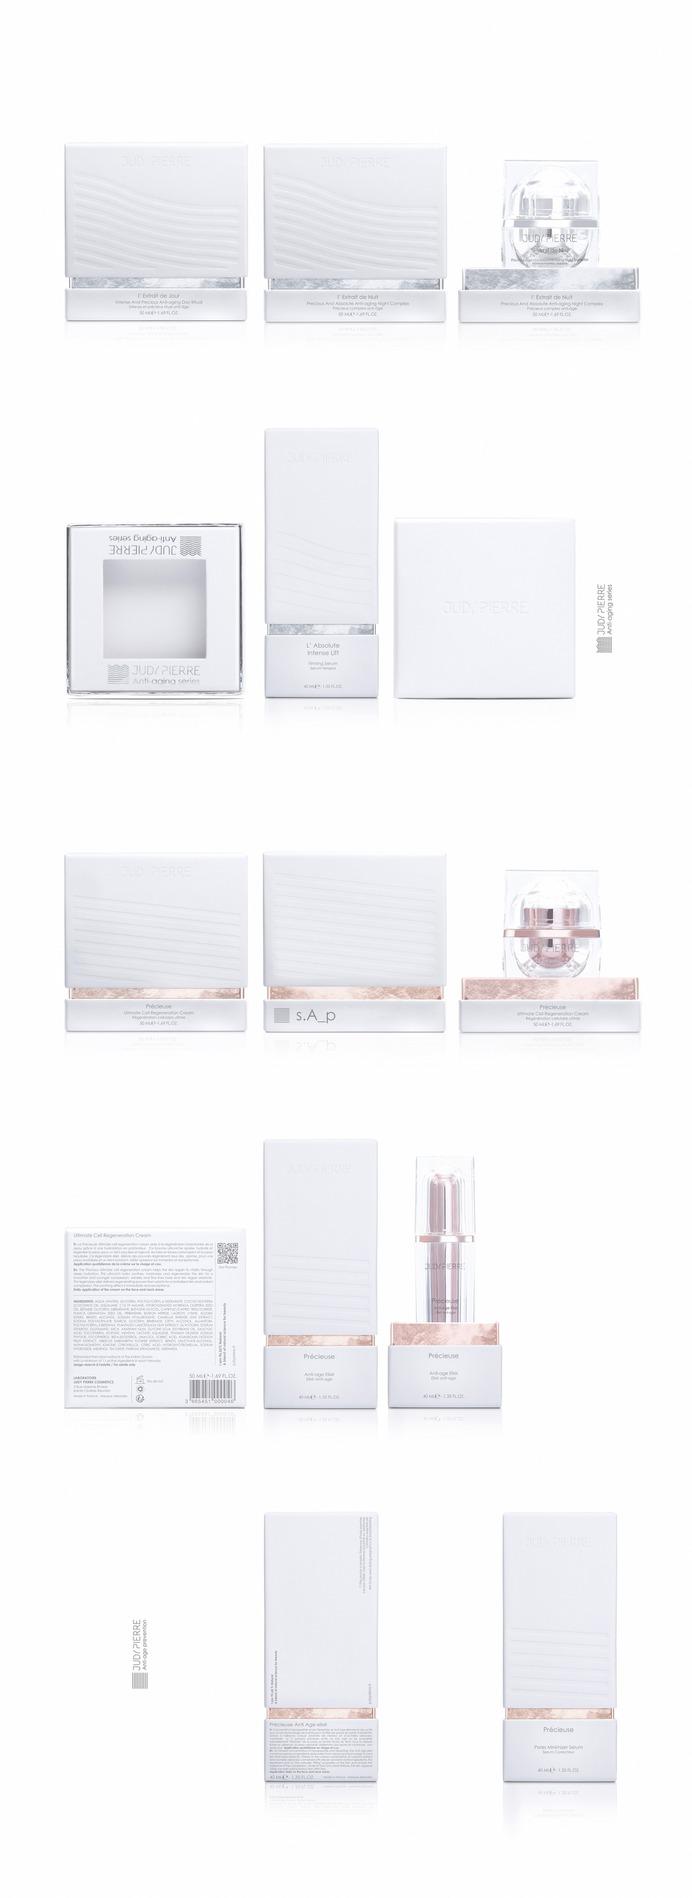 Judy Pierre Cosmetics - Ruto Design Studio